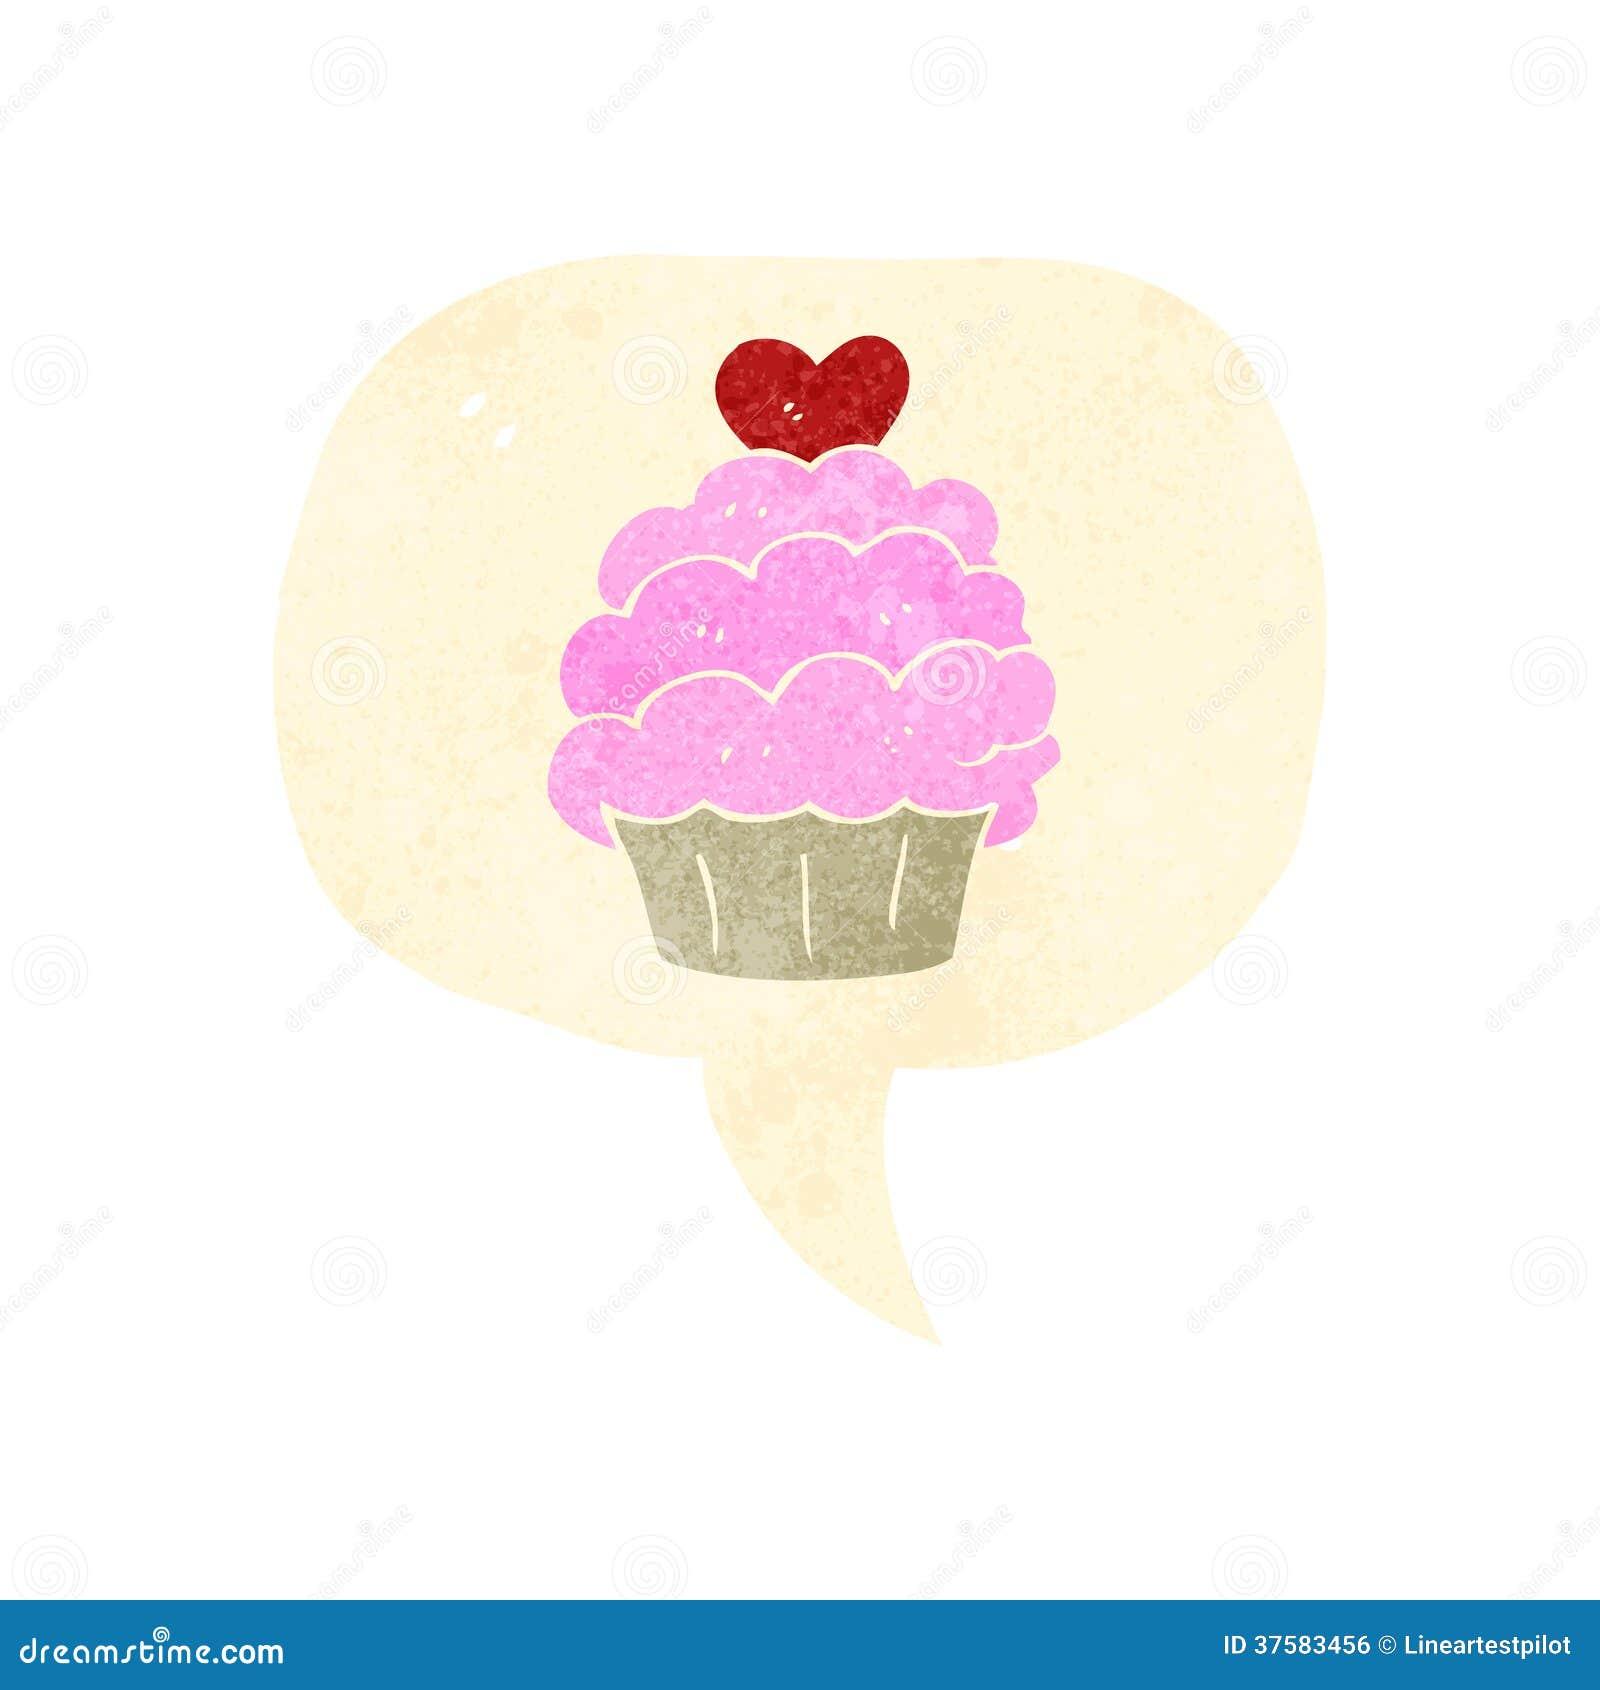 Retro Cartoon Cake Symbol Royalty Free Stock Image Image